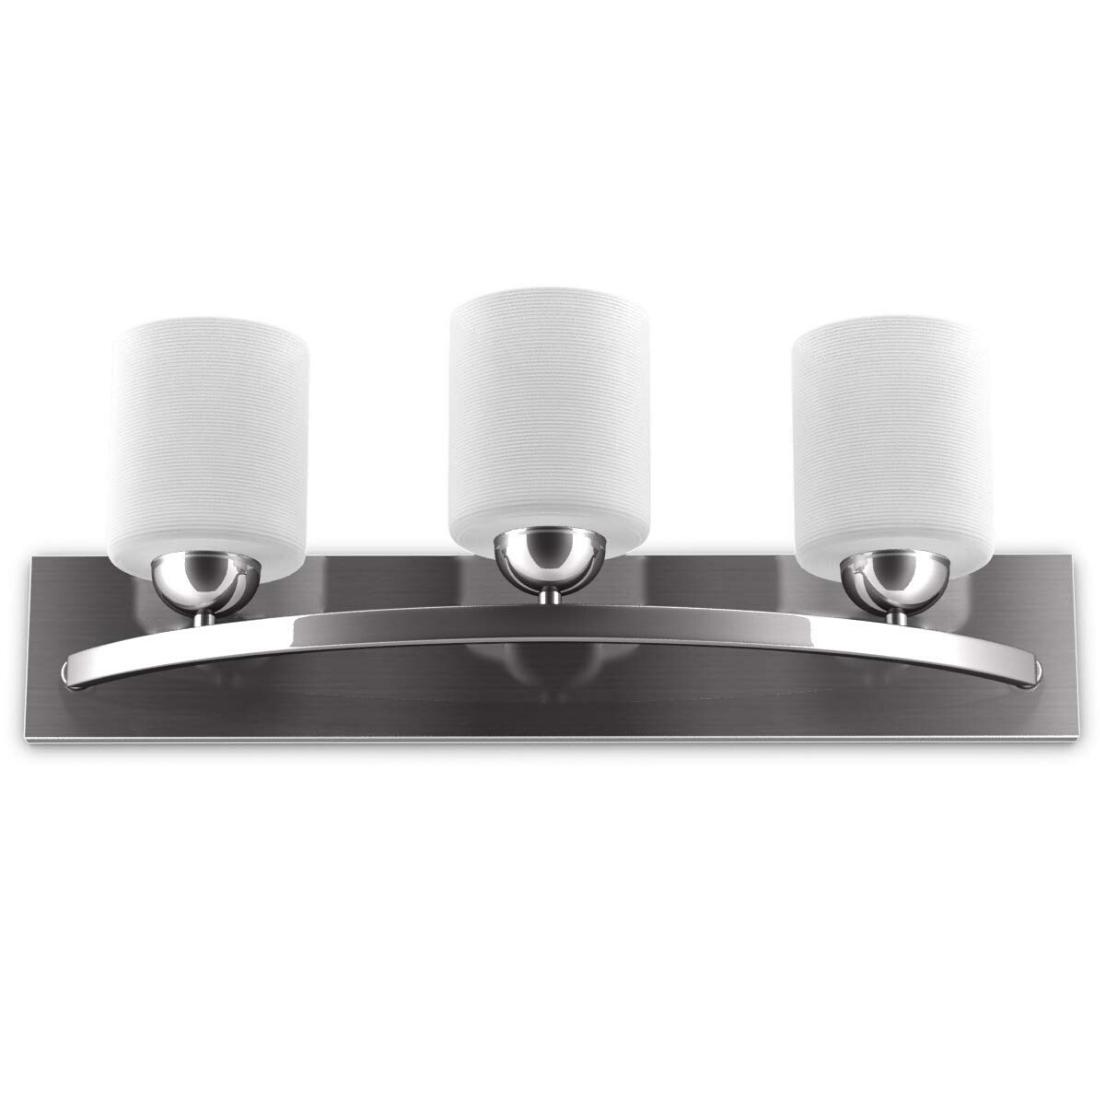 Image of: 5 Light Brushed Nickel Vanity Lights Bathroom Wall Lighting Fixtures Traditional For Sale Online Ebay